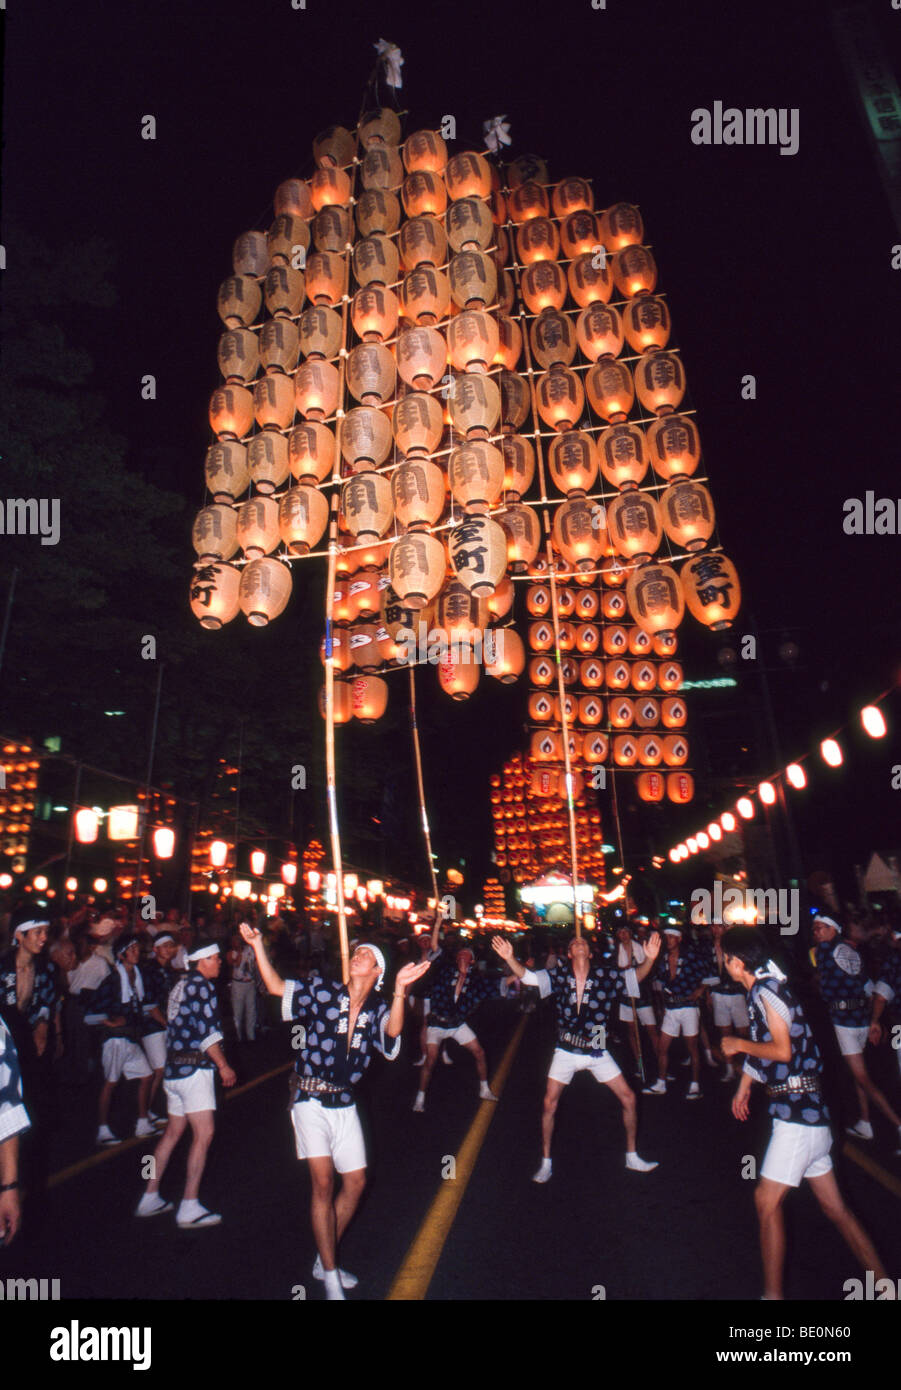 Festival participants balance lighted paper lanterns Kanto matsuri (festival), Akita Japan Stock Photo